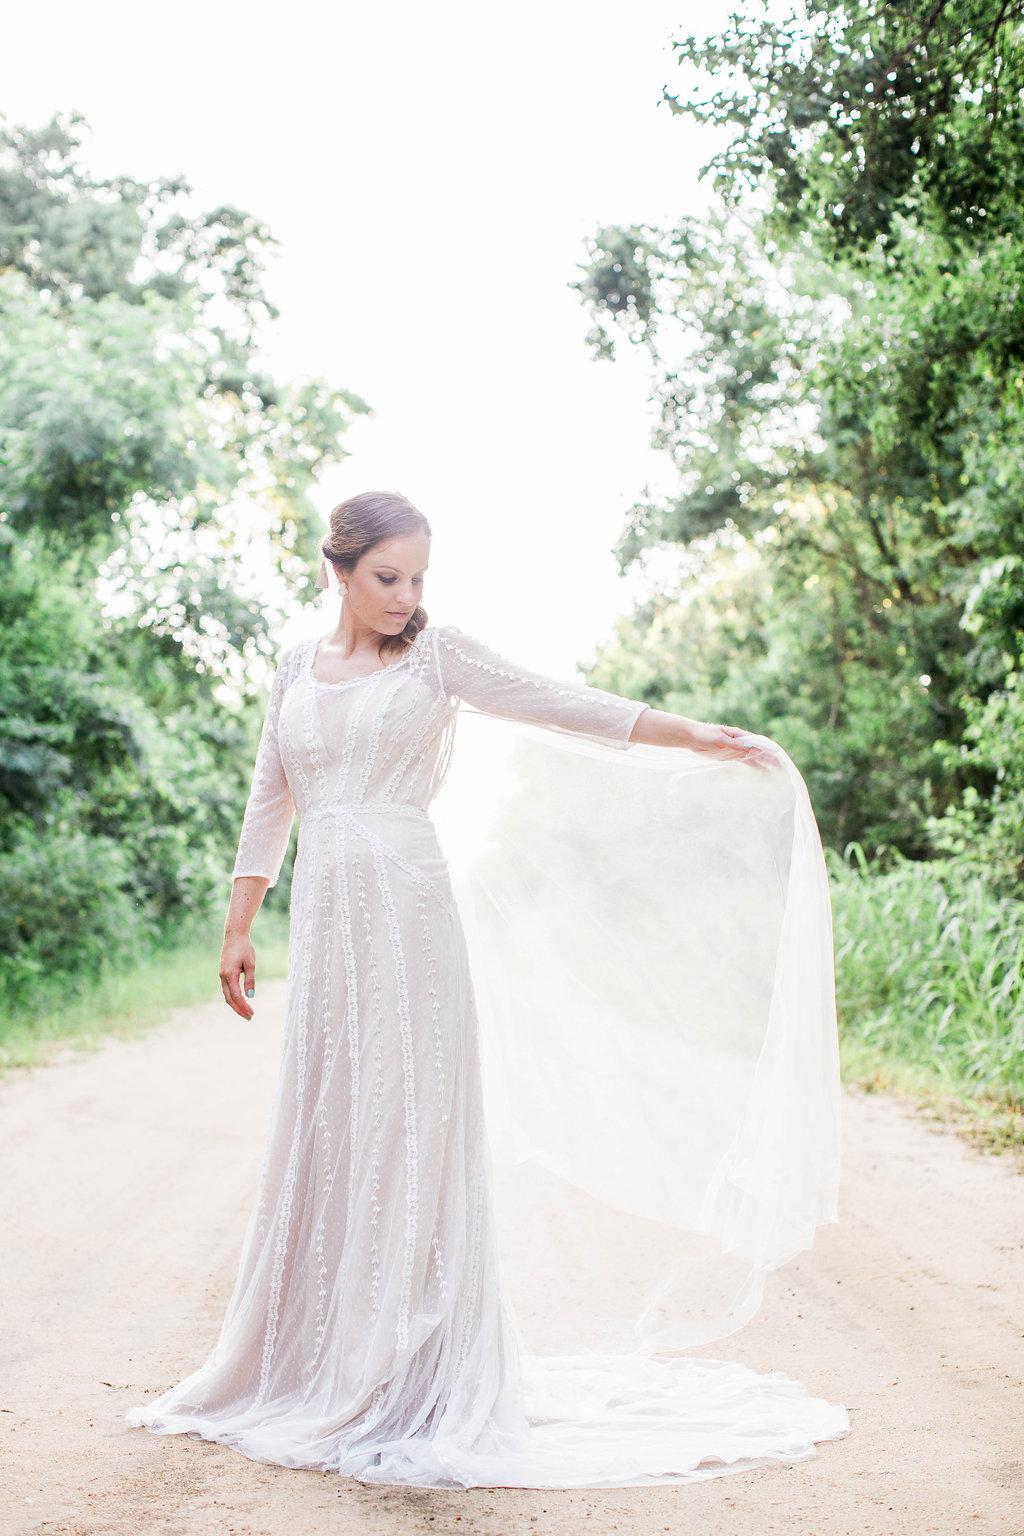 apt-b-photography-ivory-and-beau-bridal-boutique-anna-campbell-isobelle-australian-wedding-the-collins-quarter-savannah-wedding-savannah-weddings-savannah-florist-savannah-bridal-savannah-event-designer-savannah-wedding-dresses-outback-wedding-25.jpg